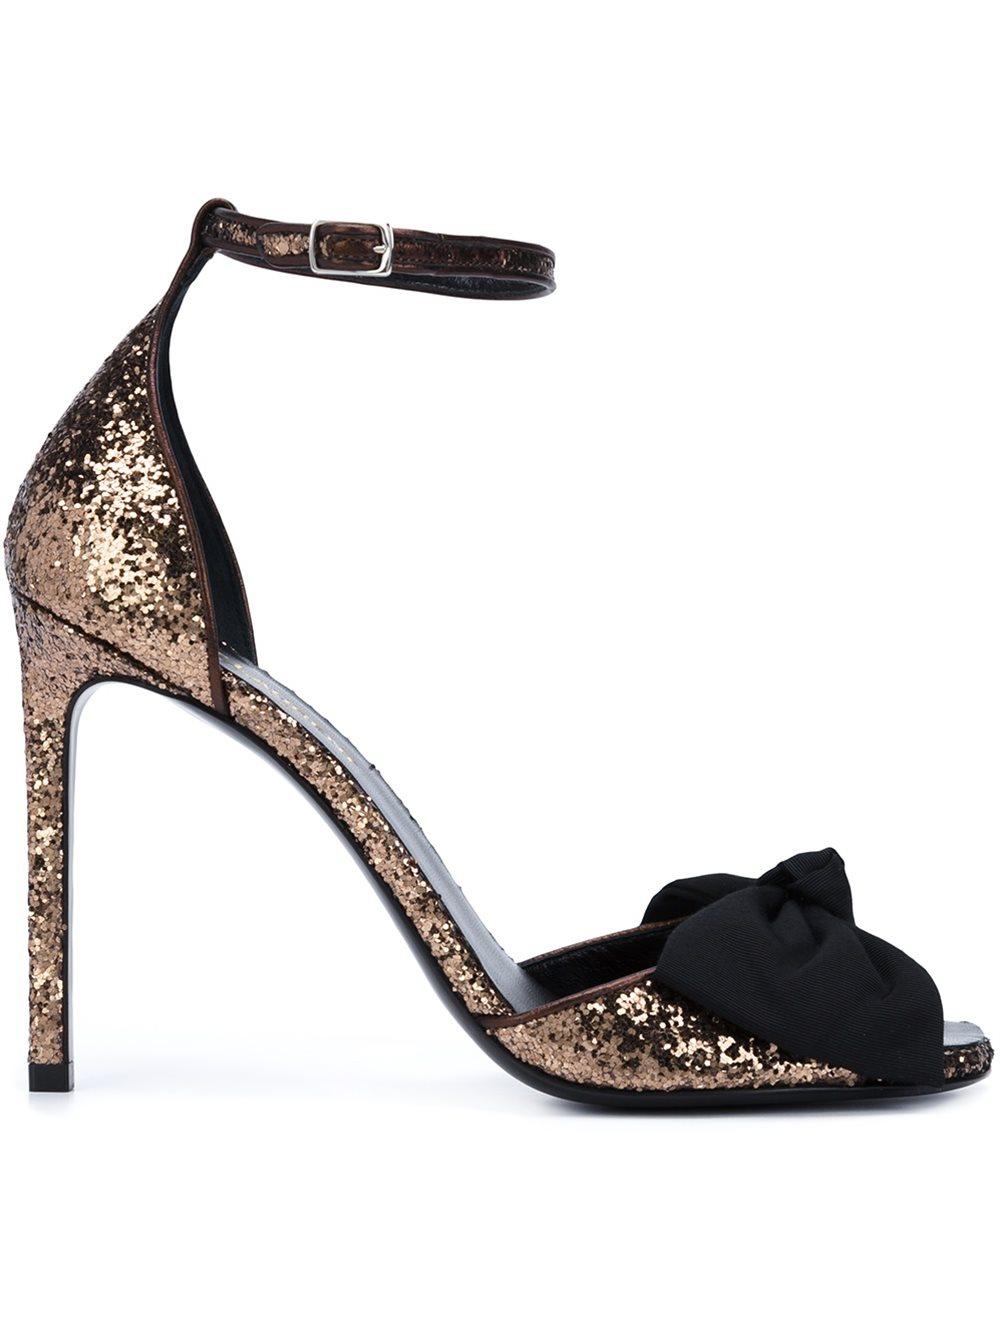 saint laurent glitter heels.jpg